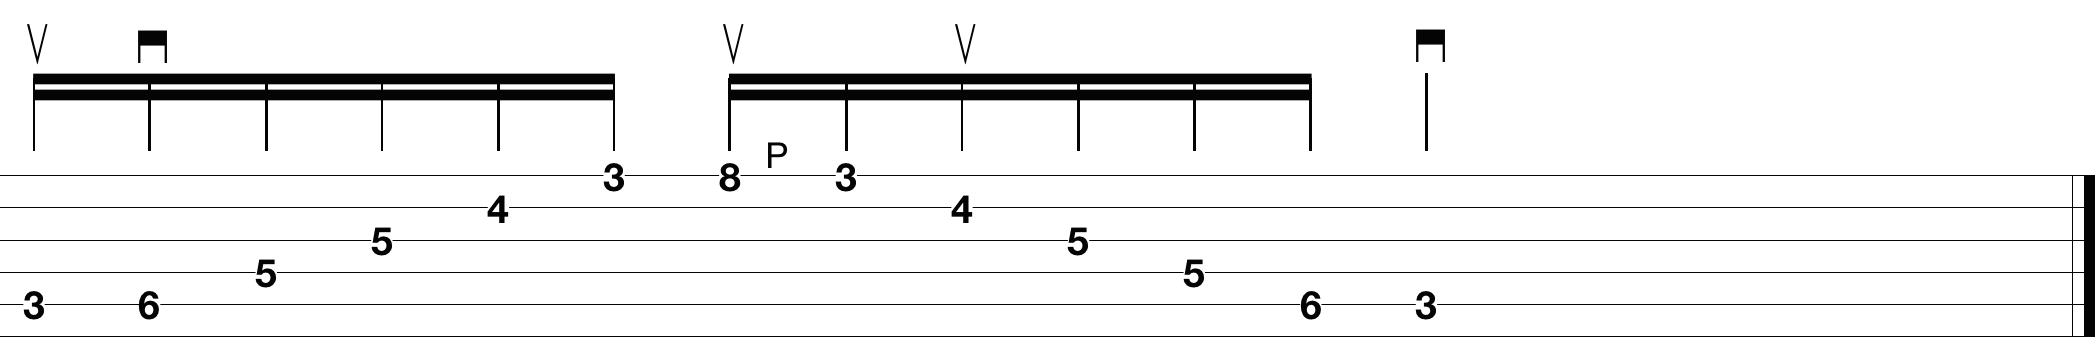 shredding-on-guitar_2.png